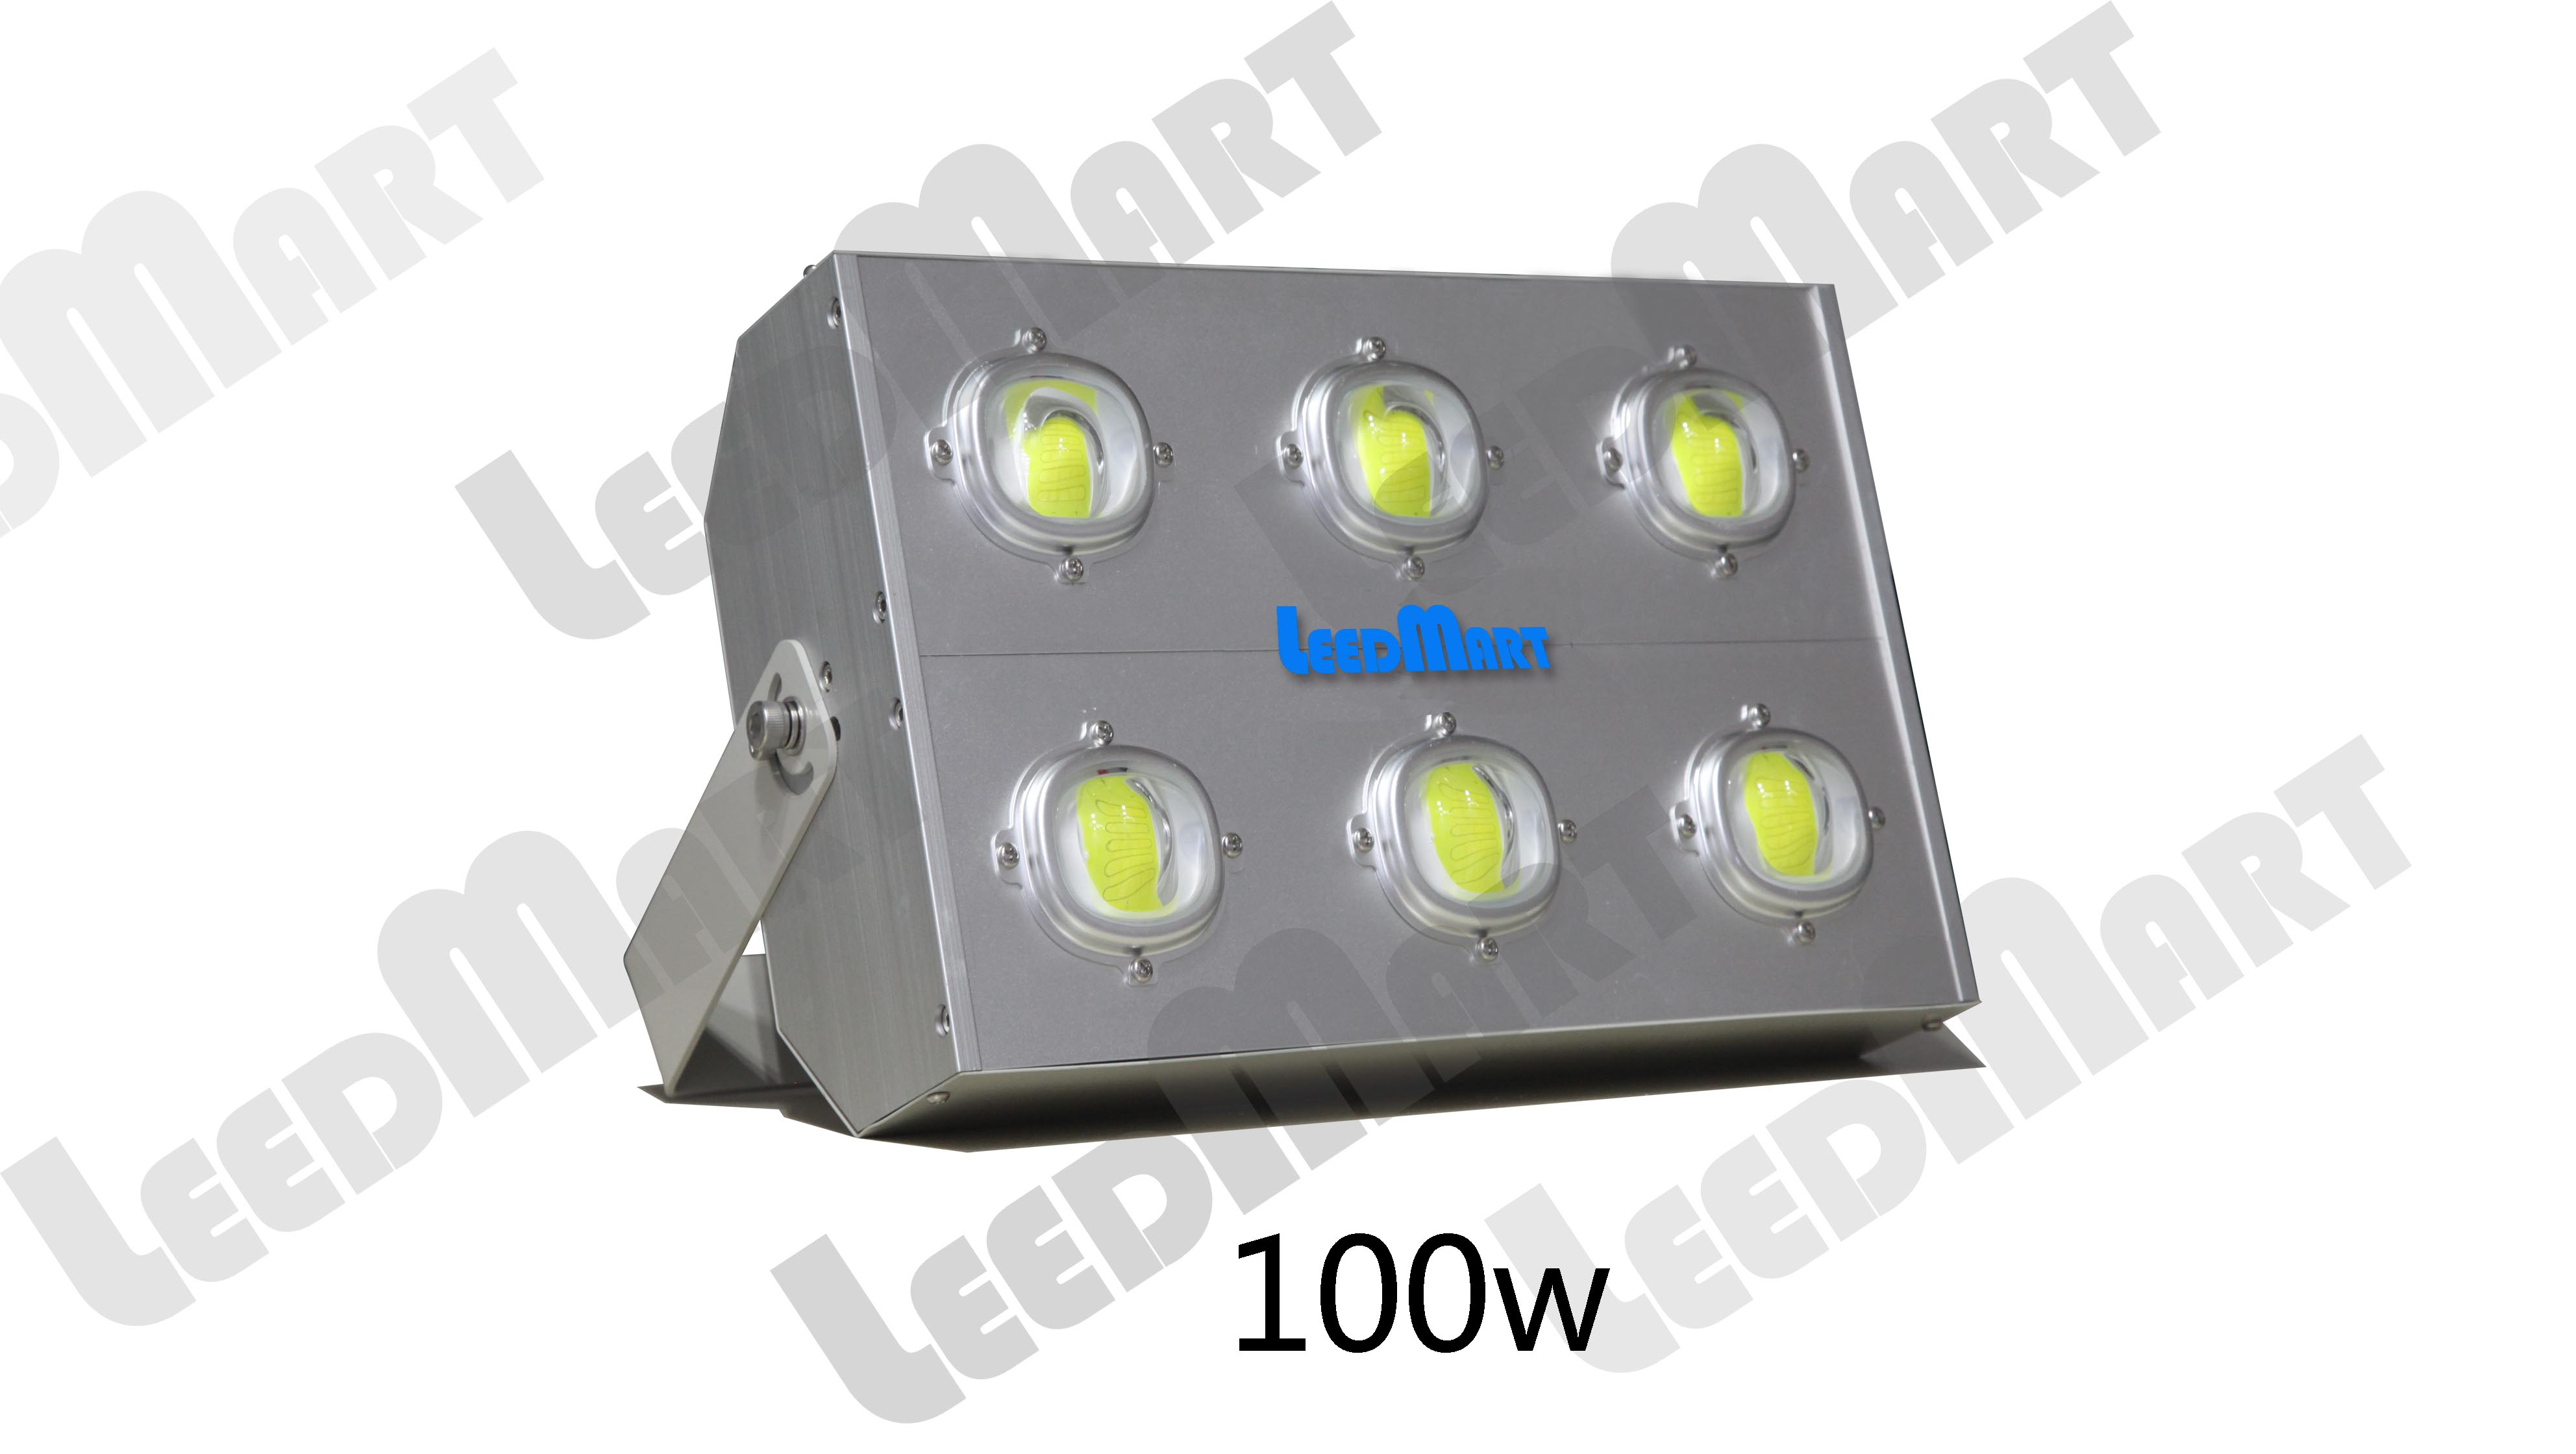 Compact LED flood light IP65 50 watt -200 watt 24000 lumen